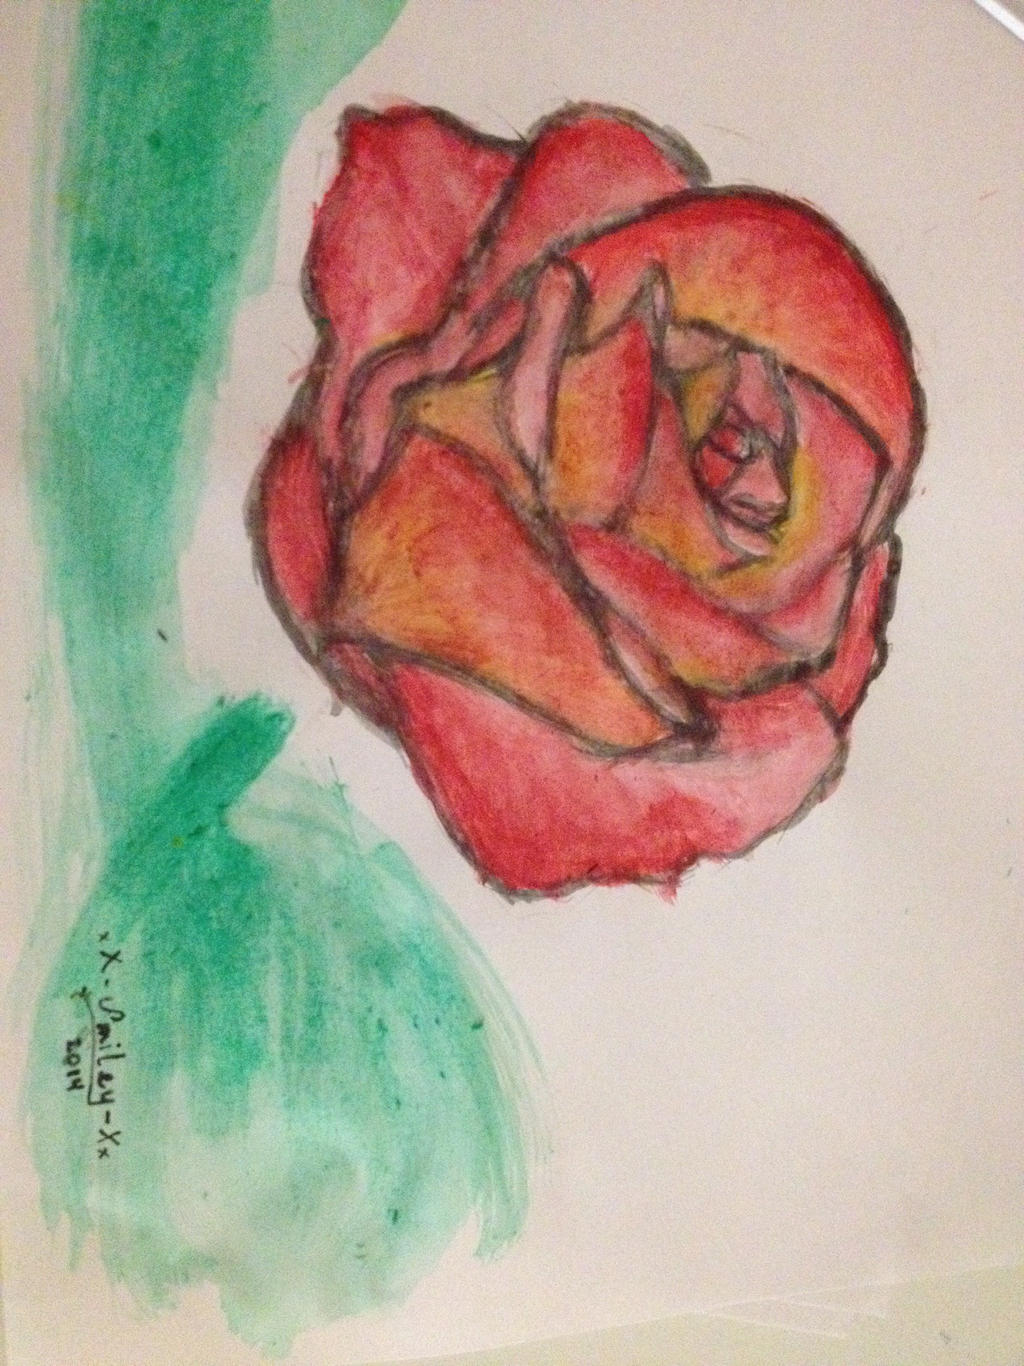 Smiley rose 🌹 Rose